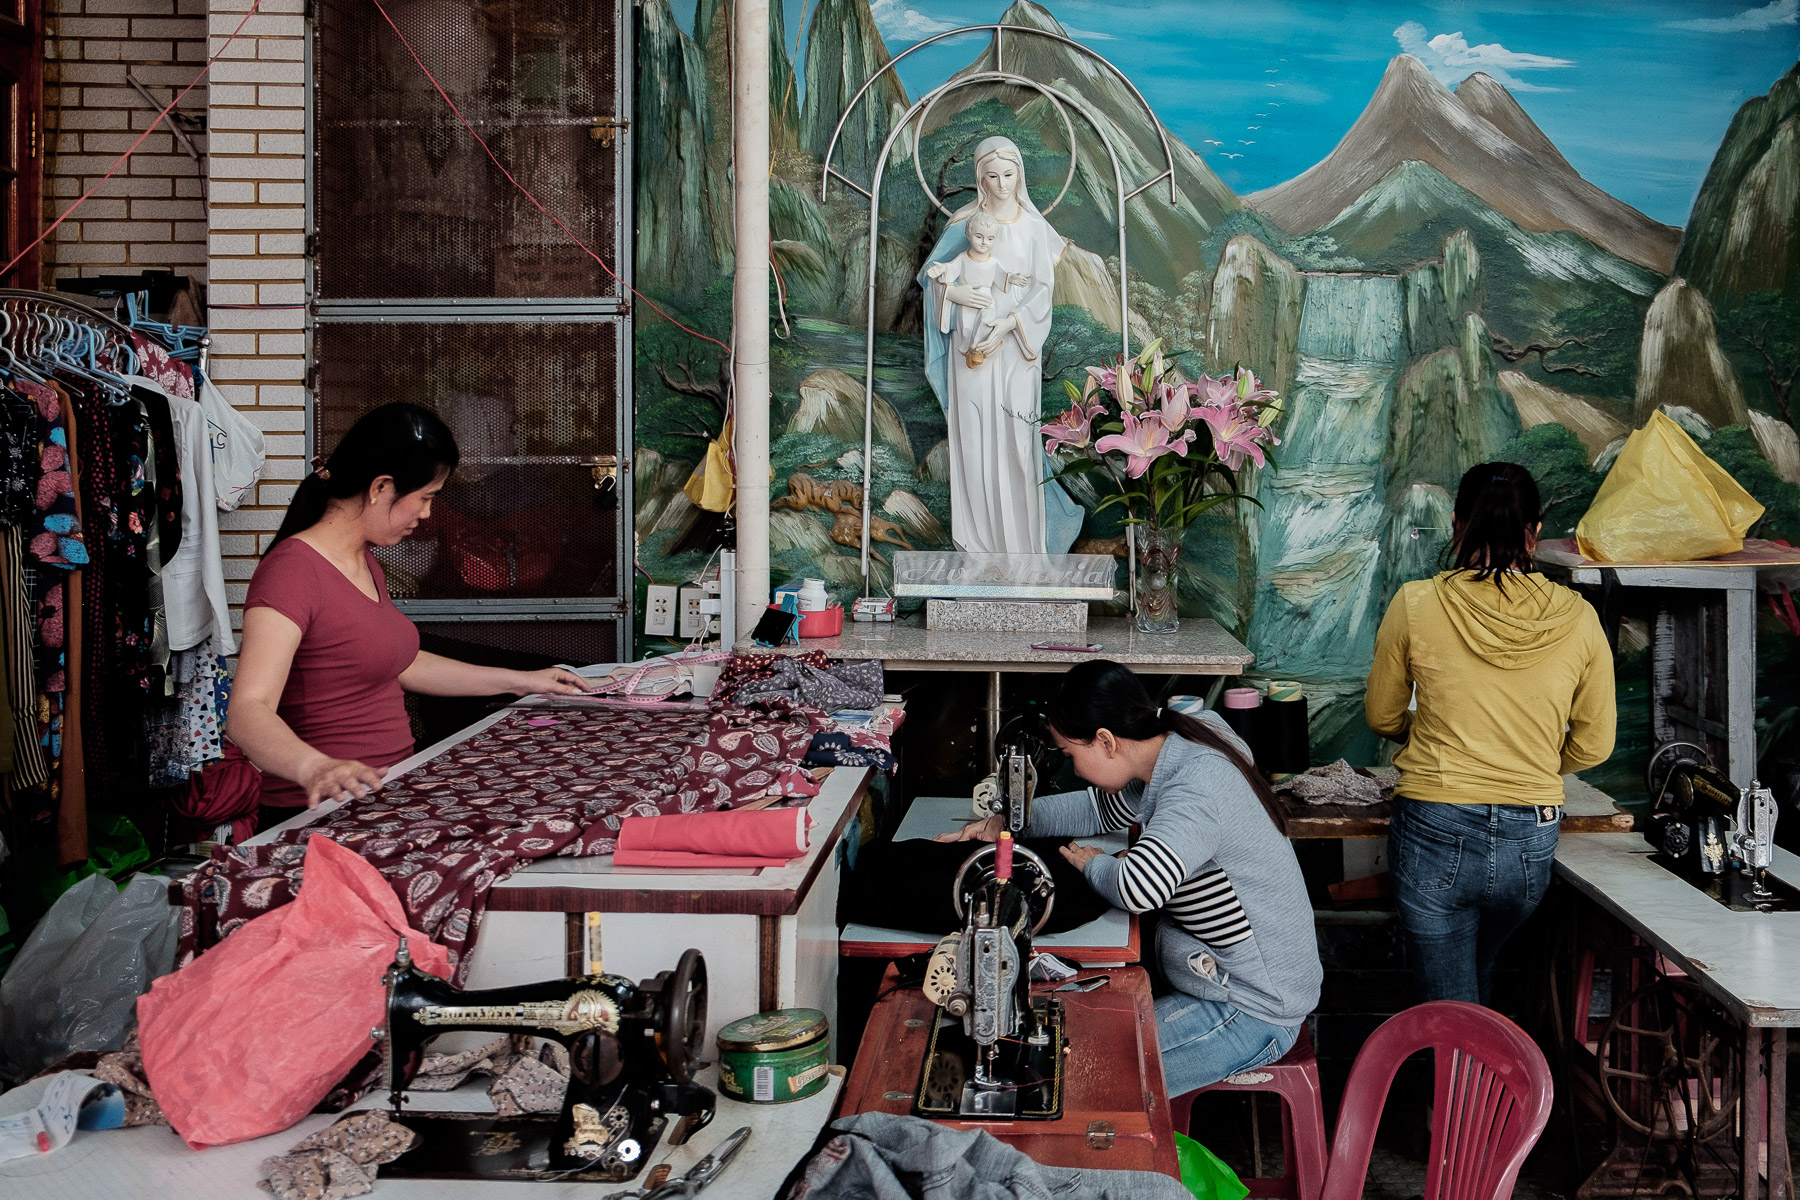 Phan Thiet, South Central Vietnam